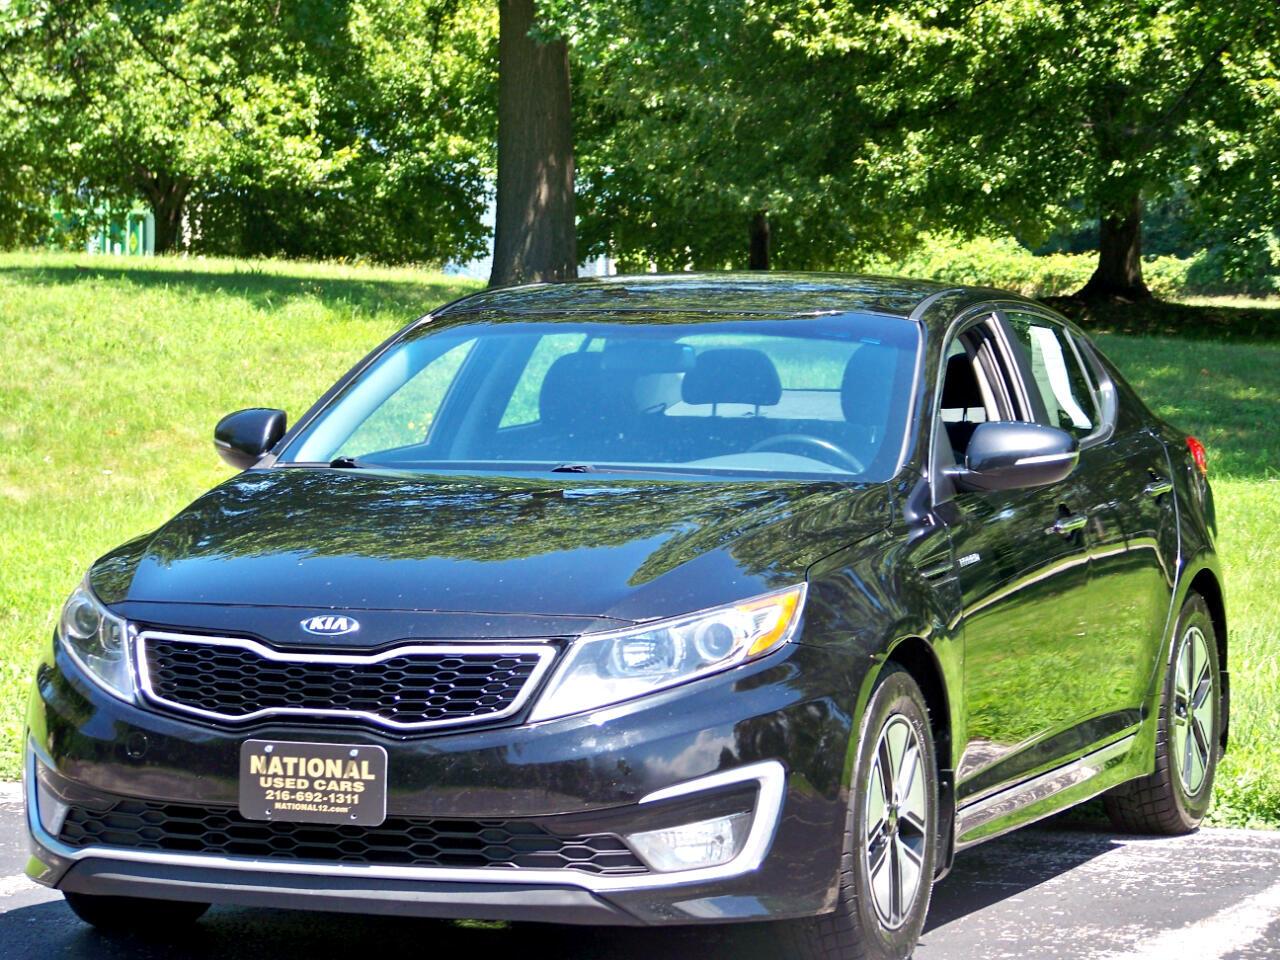 Kia Optima Hybrid LX 2013